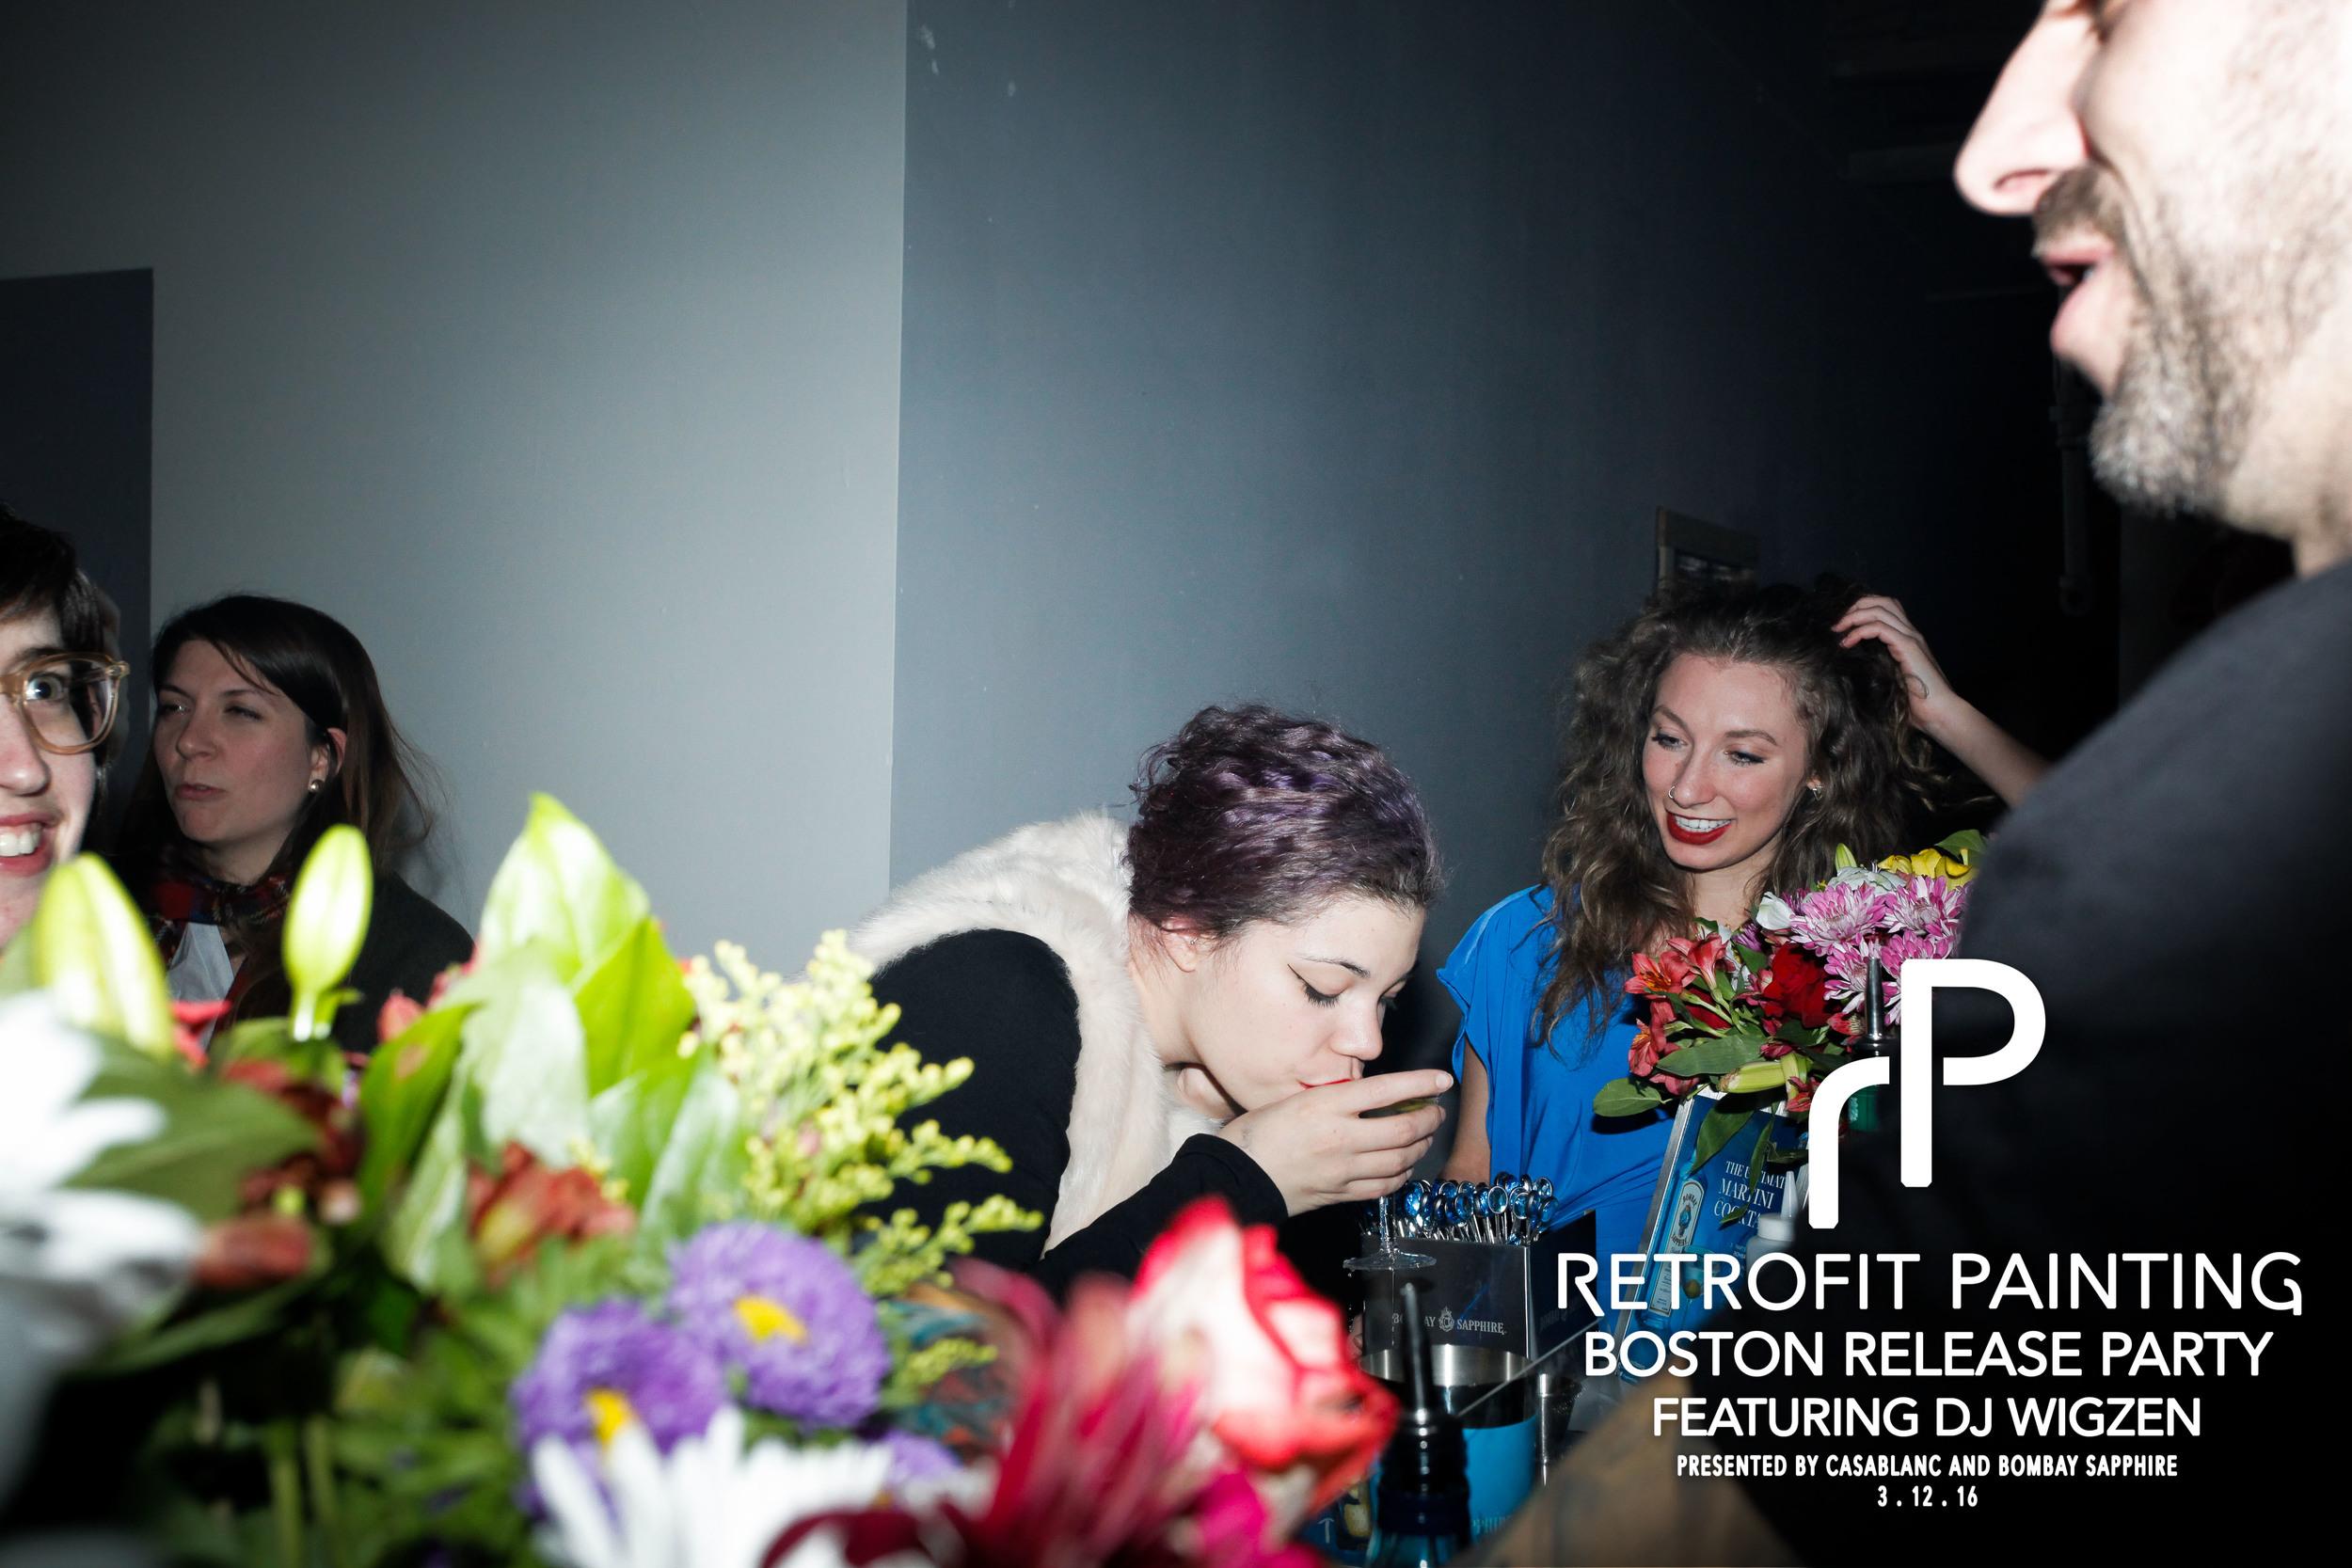 Retrofit Painting Boston Release Party 0054.jpg